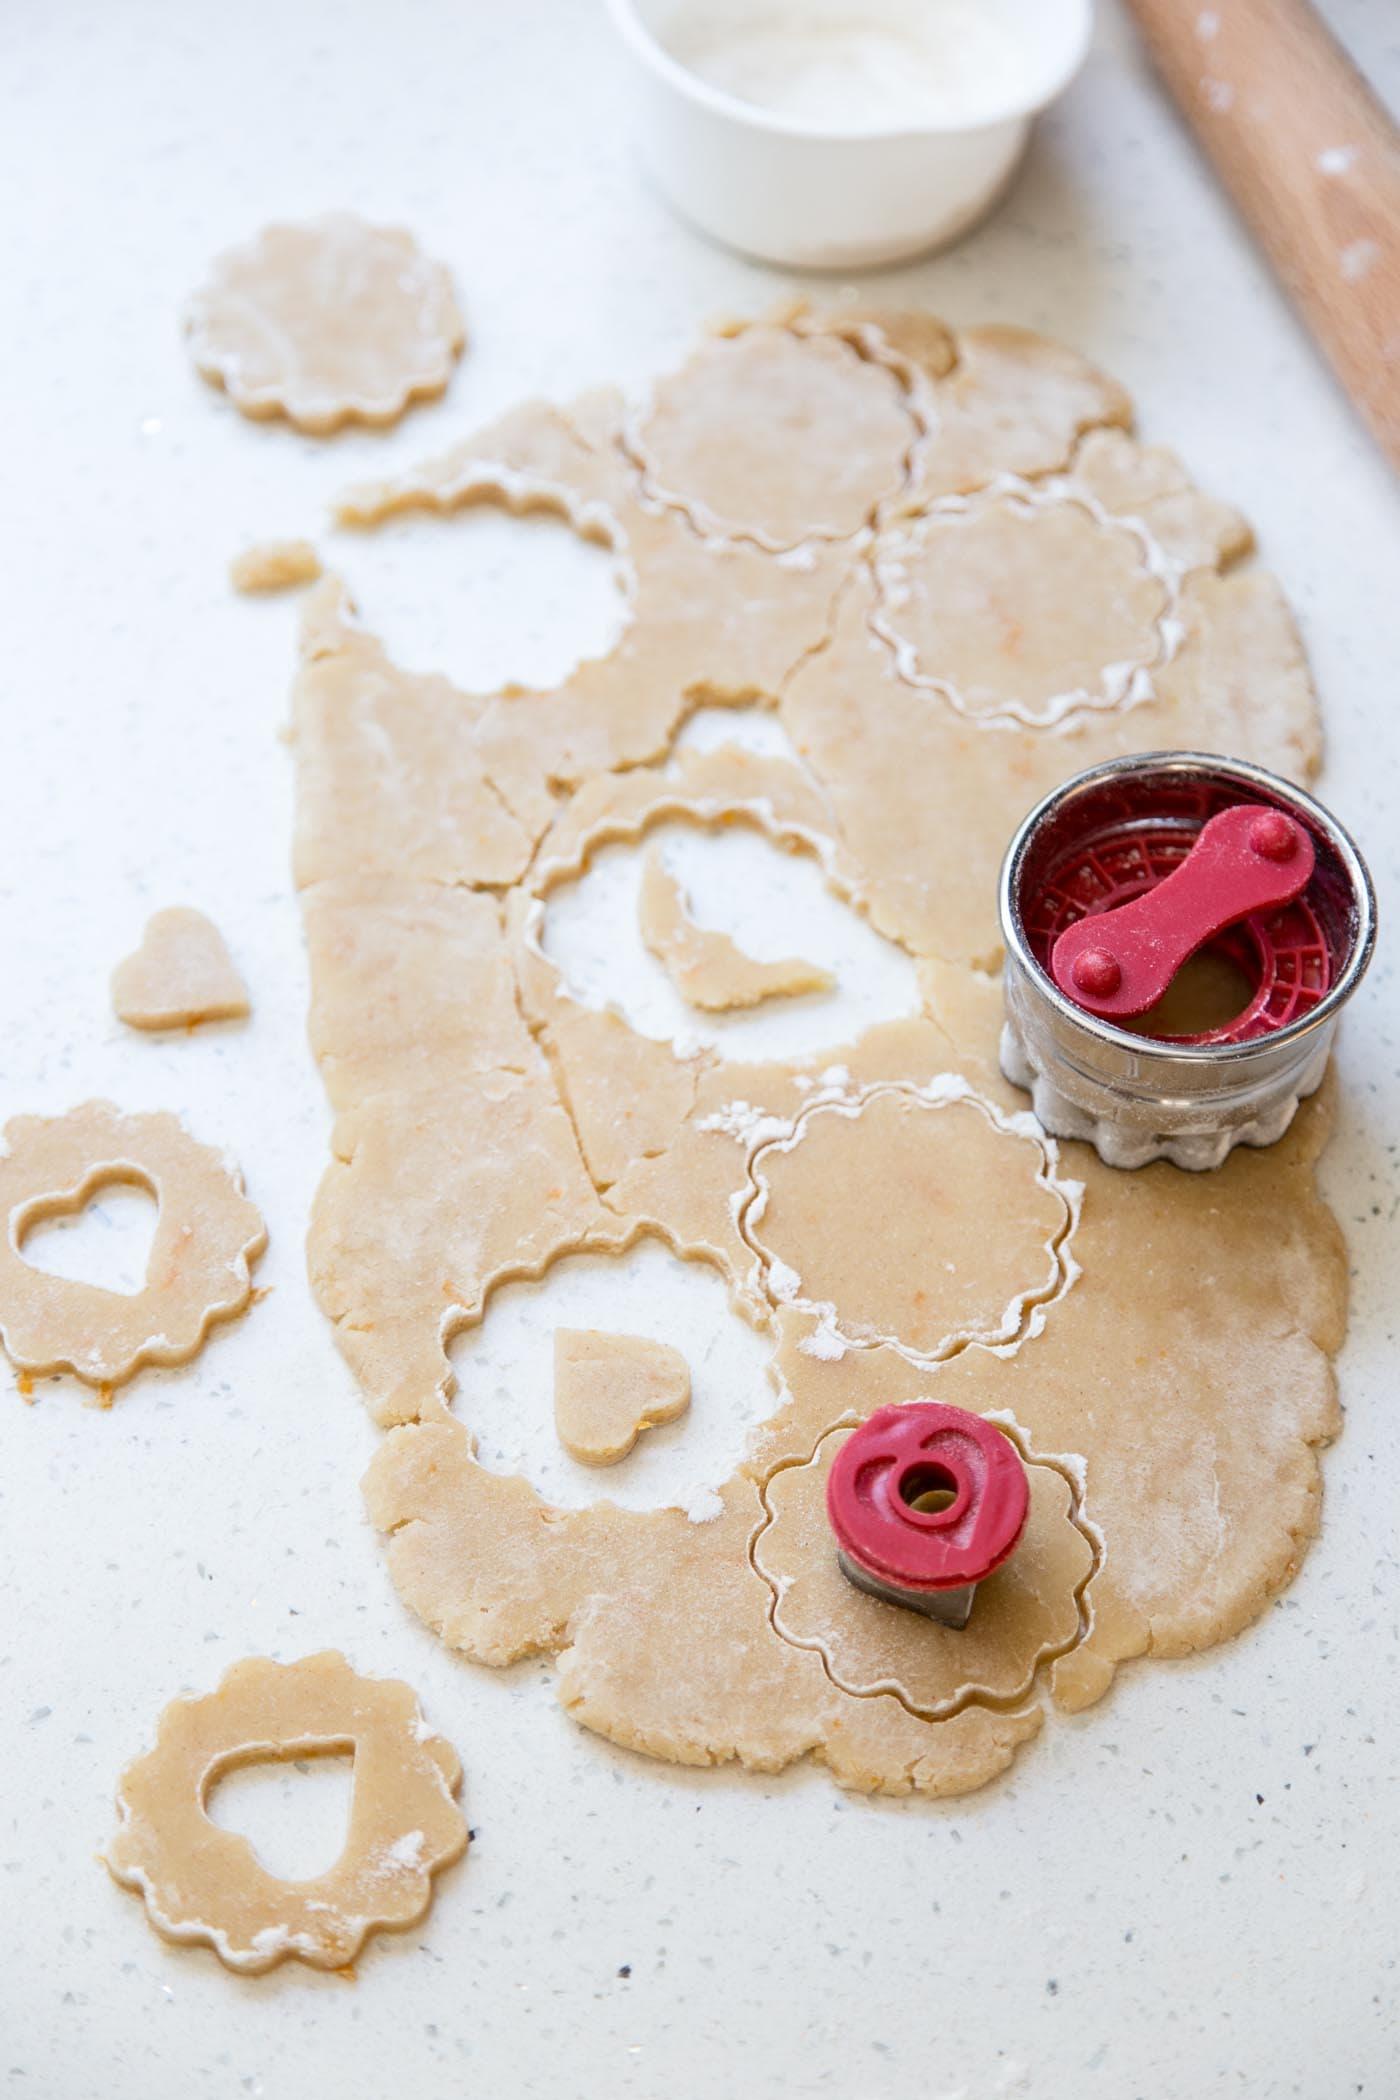 Cutting Linzer cookie dough